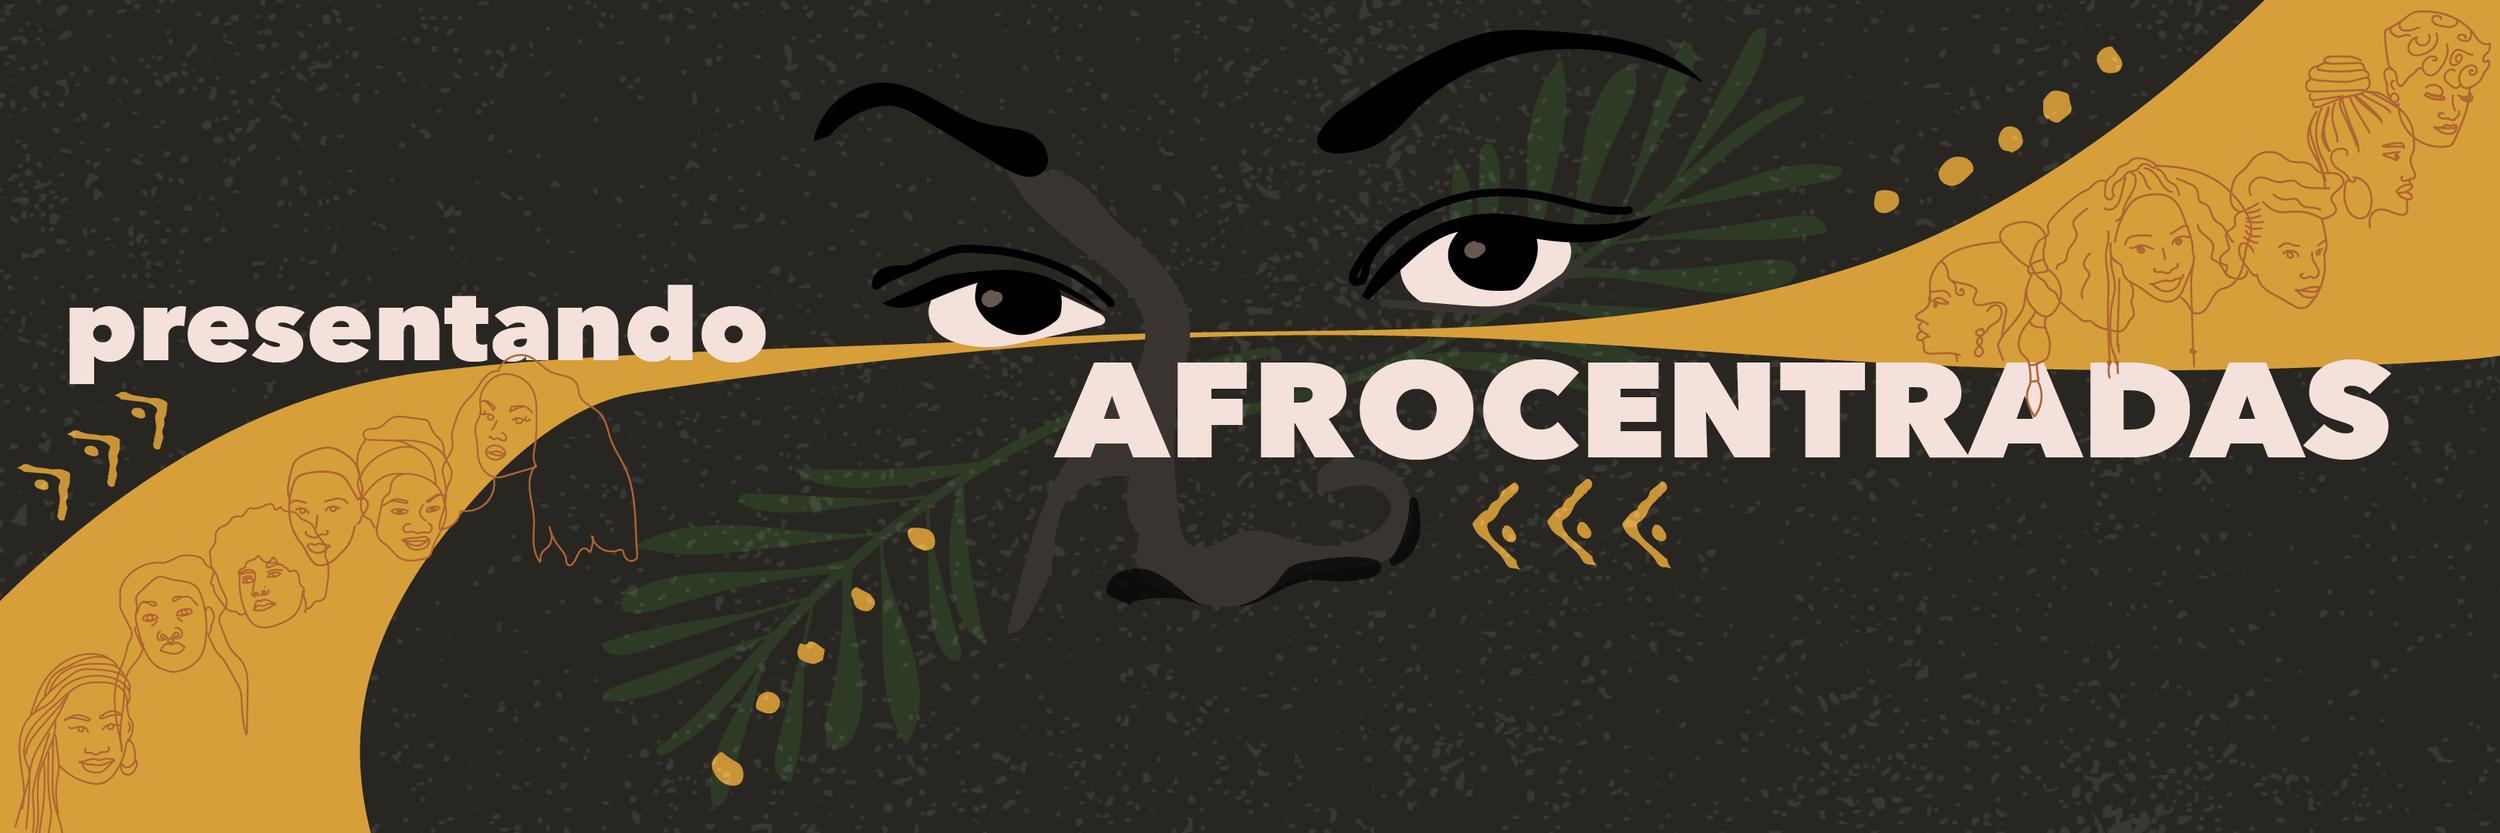 Afrocentradas Art Exhibit Marketing Materials